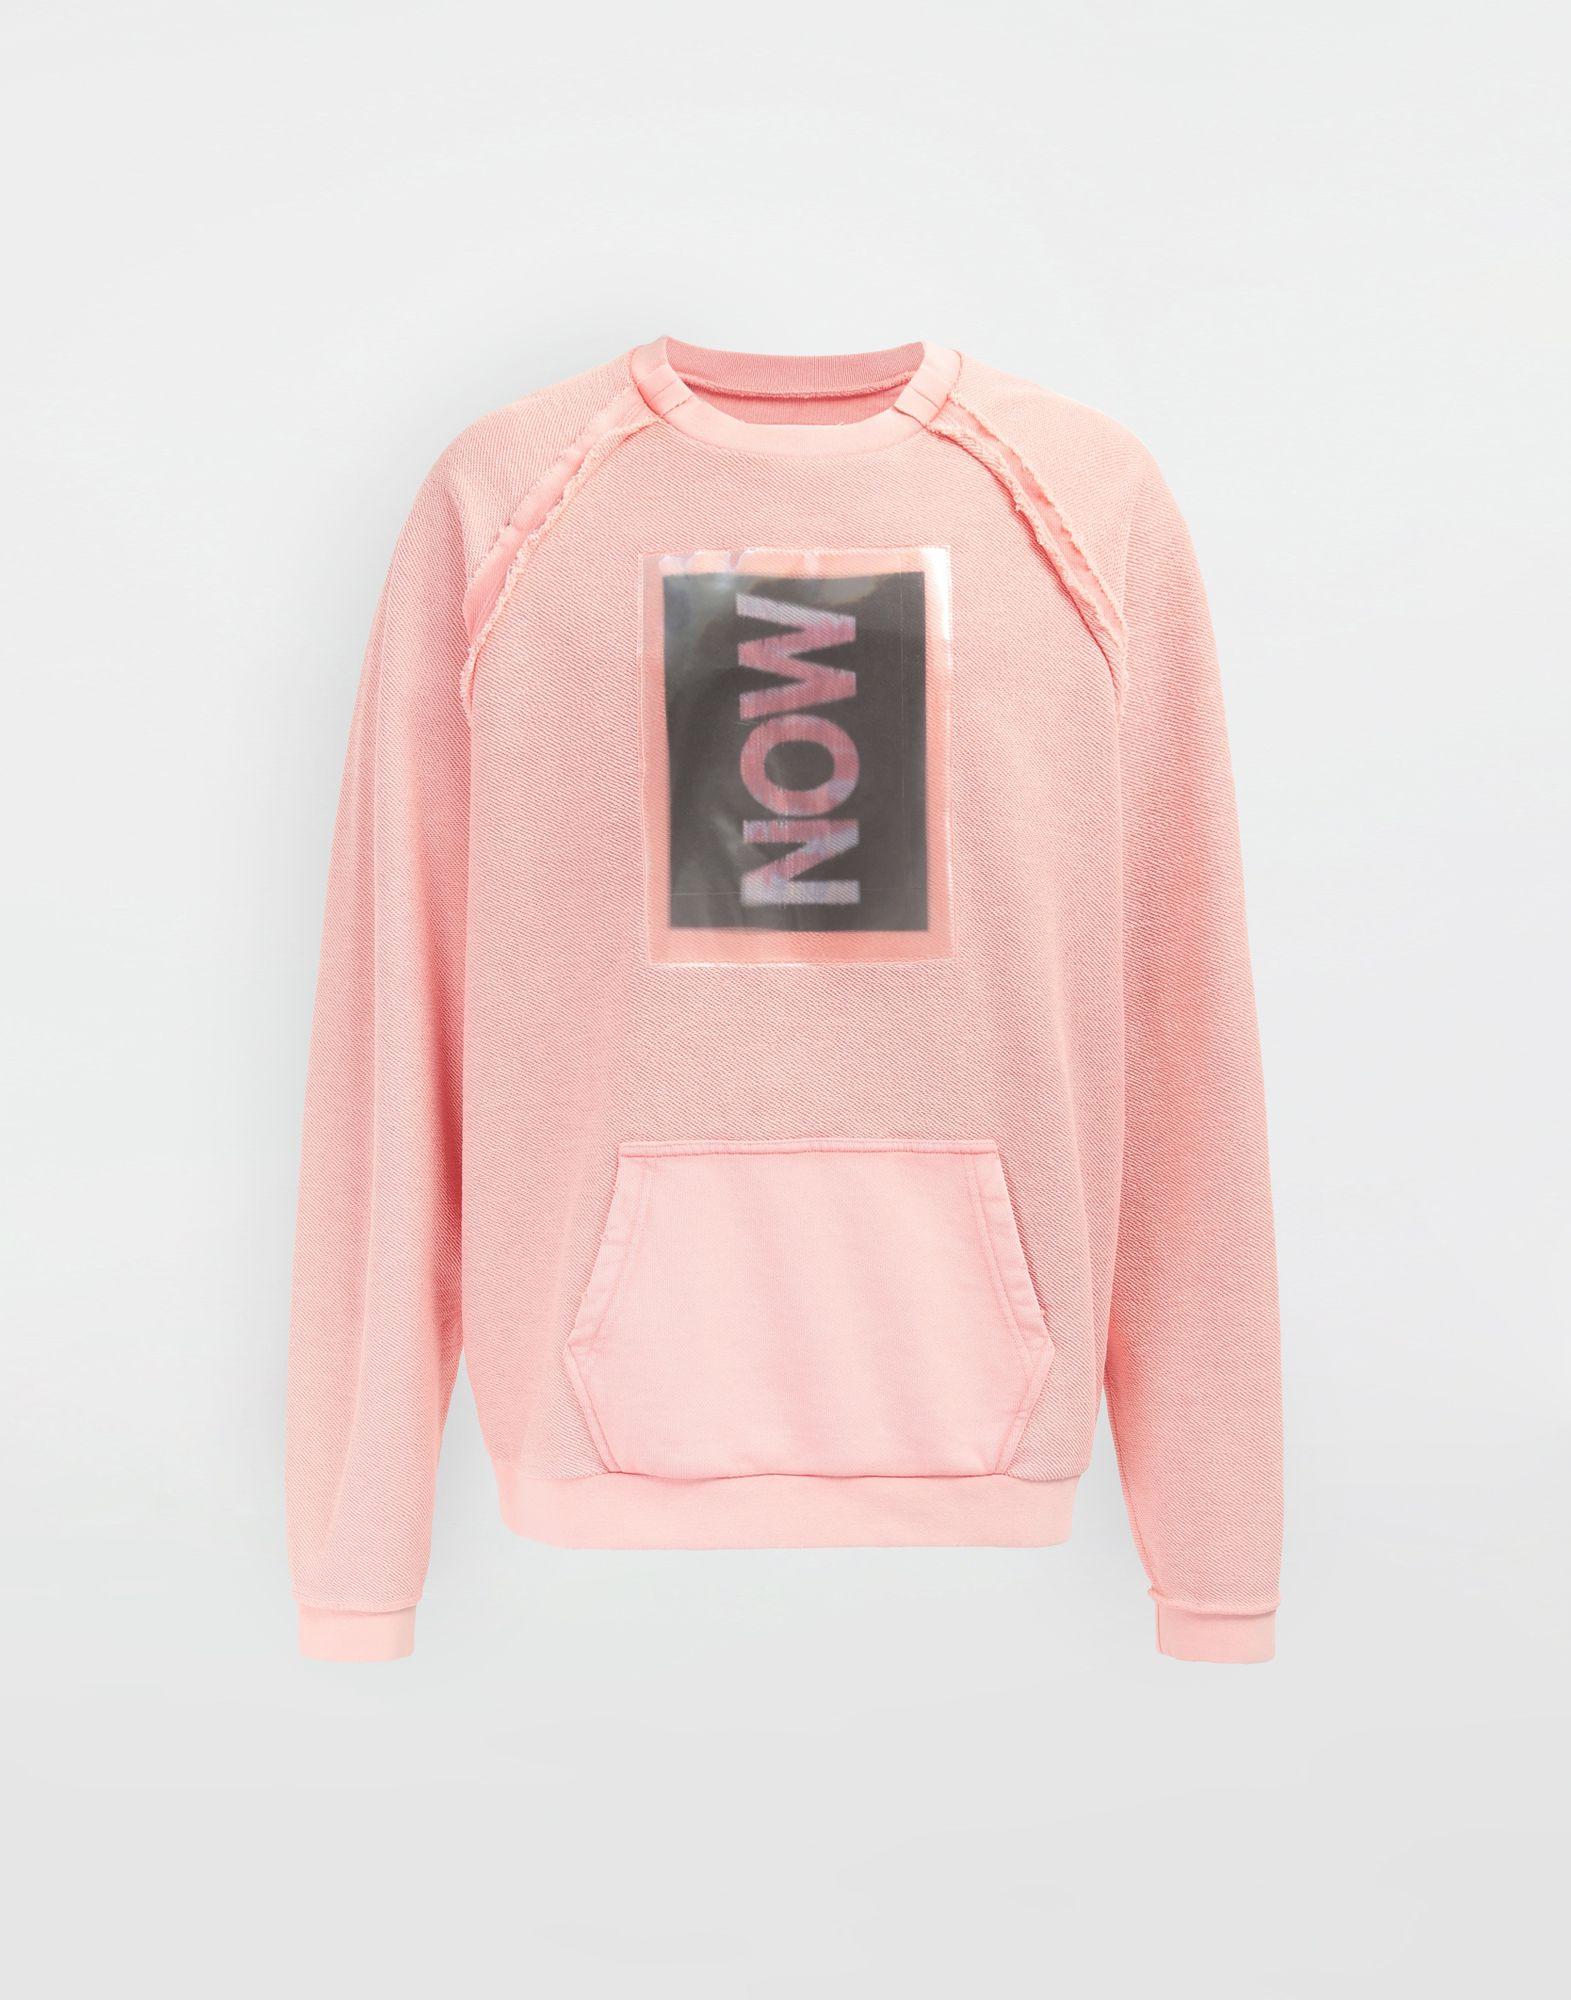 MAISON MARGIELA NOW print jersey sweatshirt Sweatshirt Man f